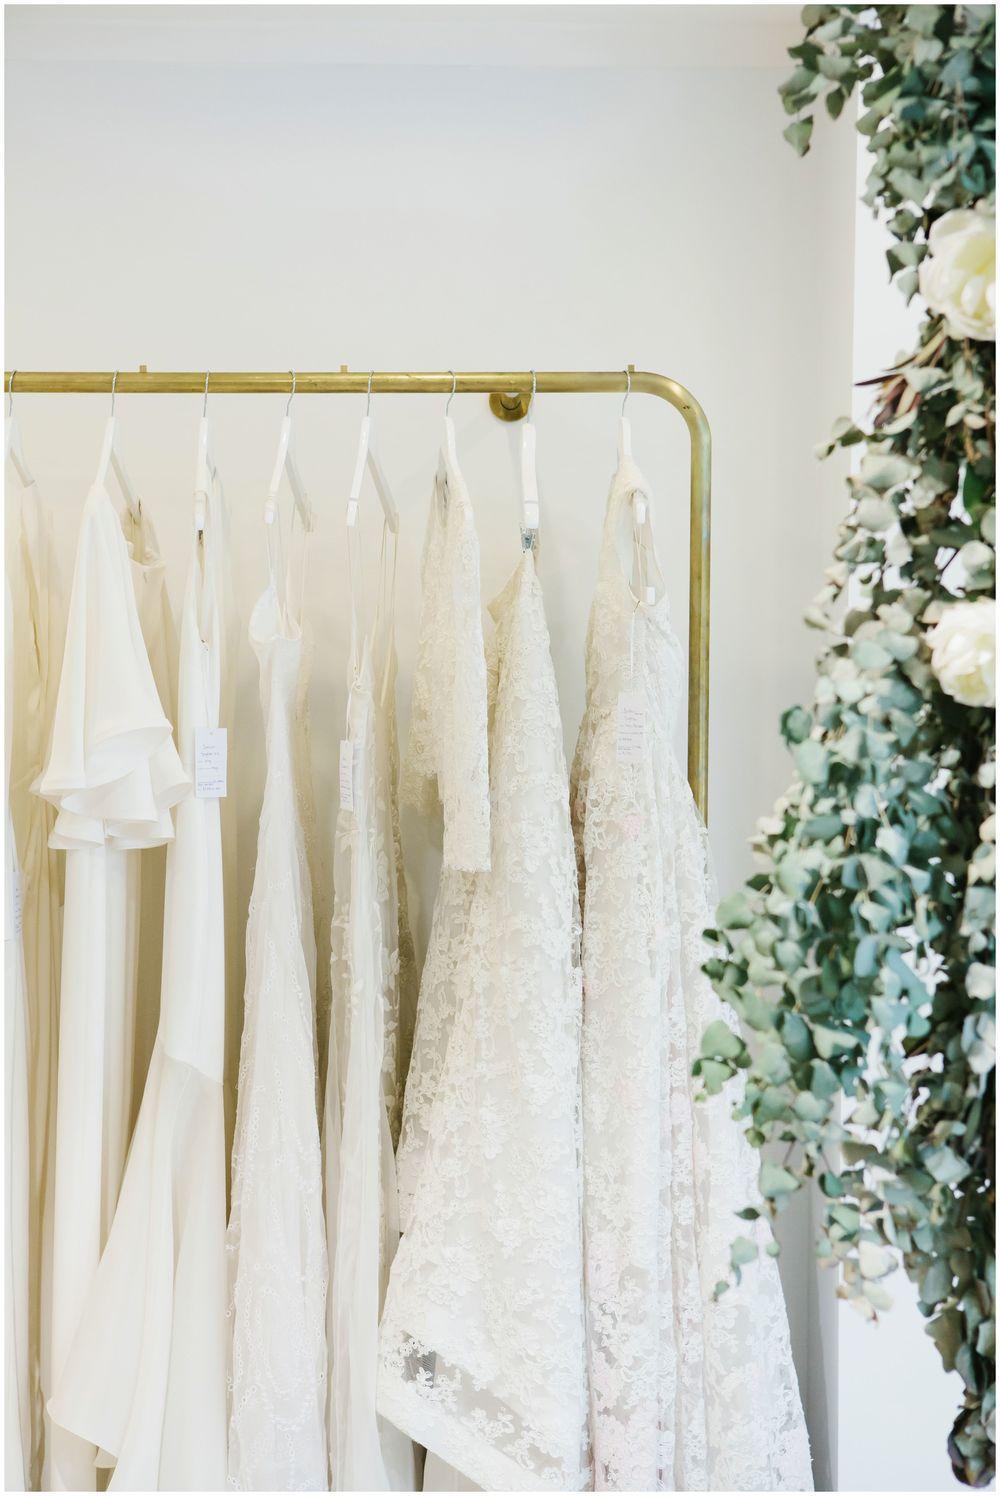 The Bridal Atelier, Sydney by Samantha Macabulos (16 of 37).jpg